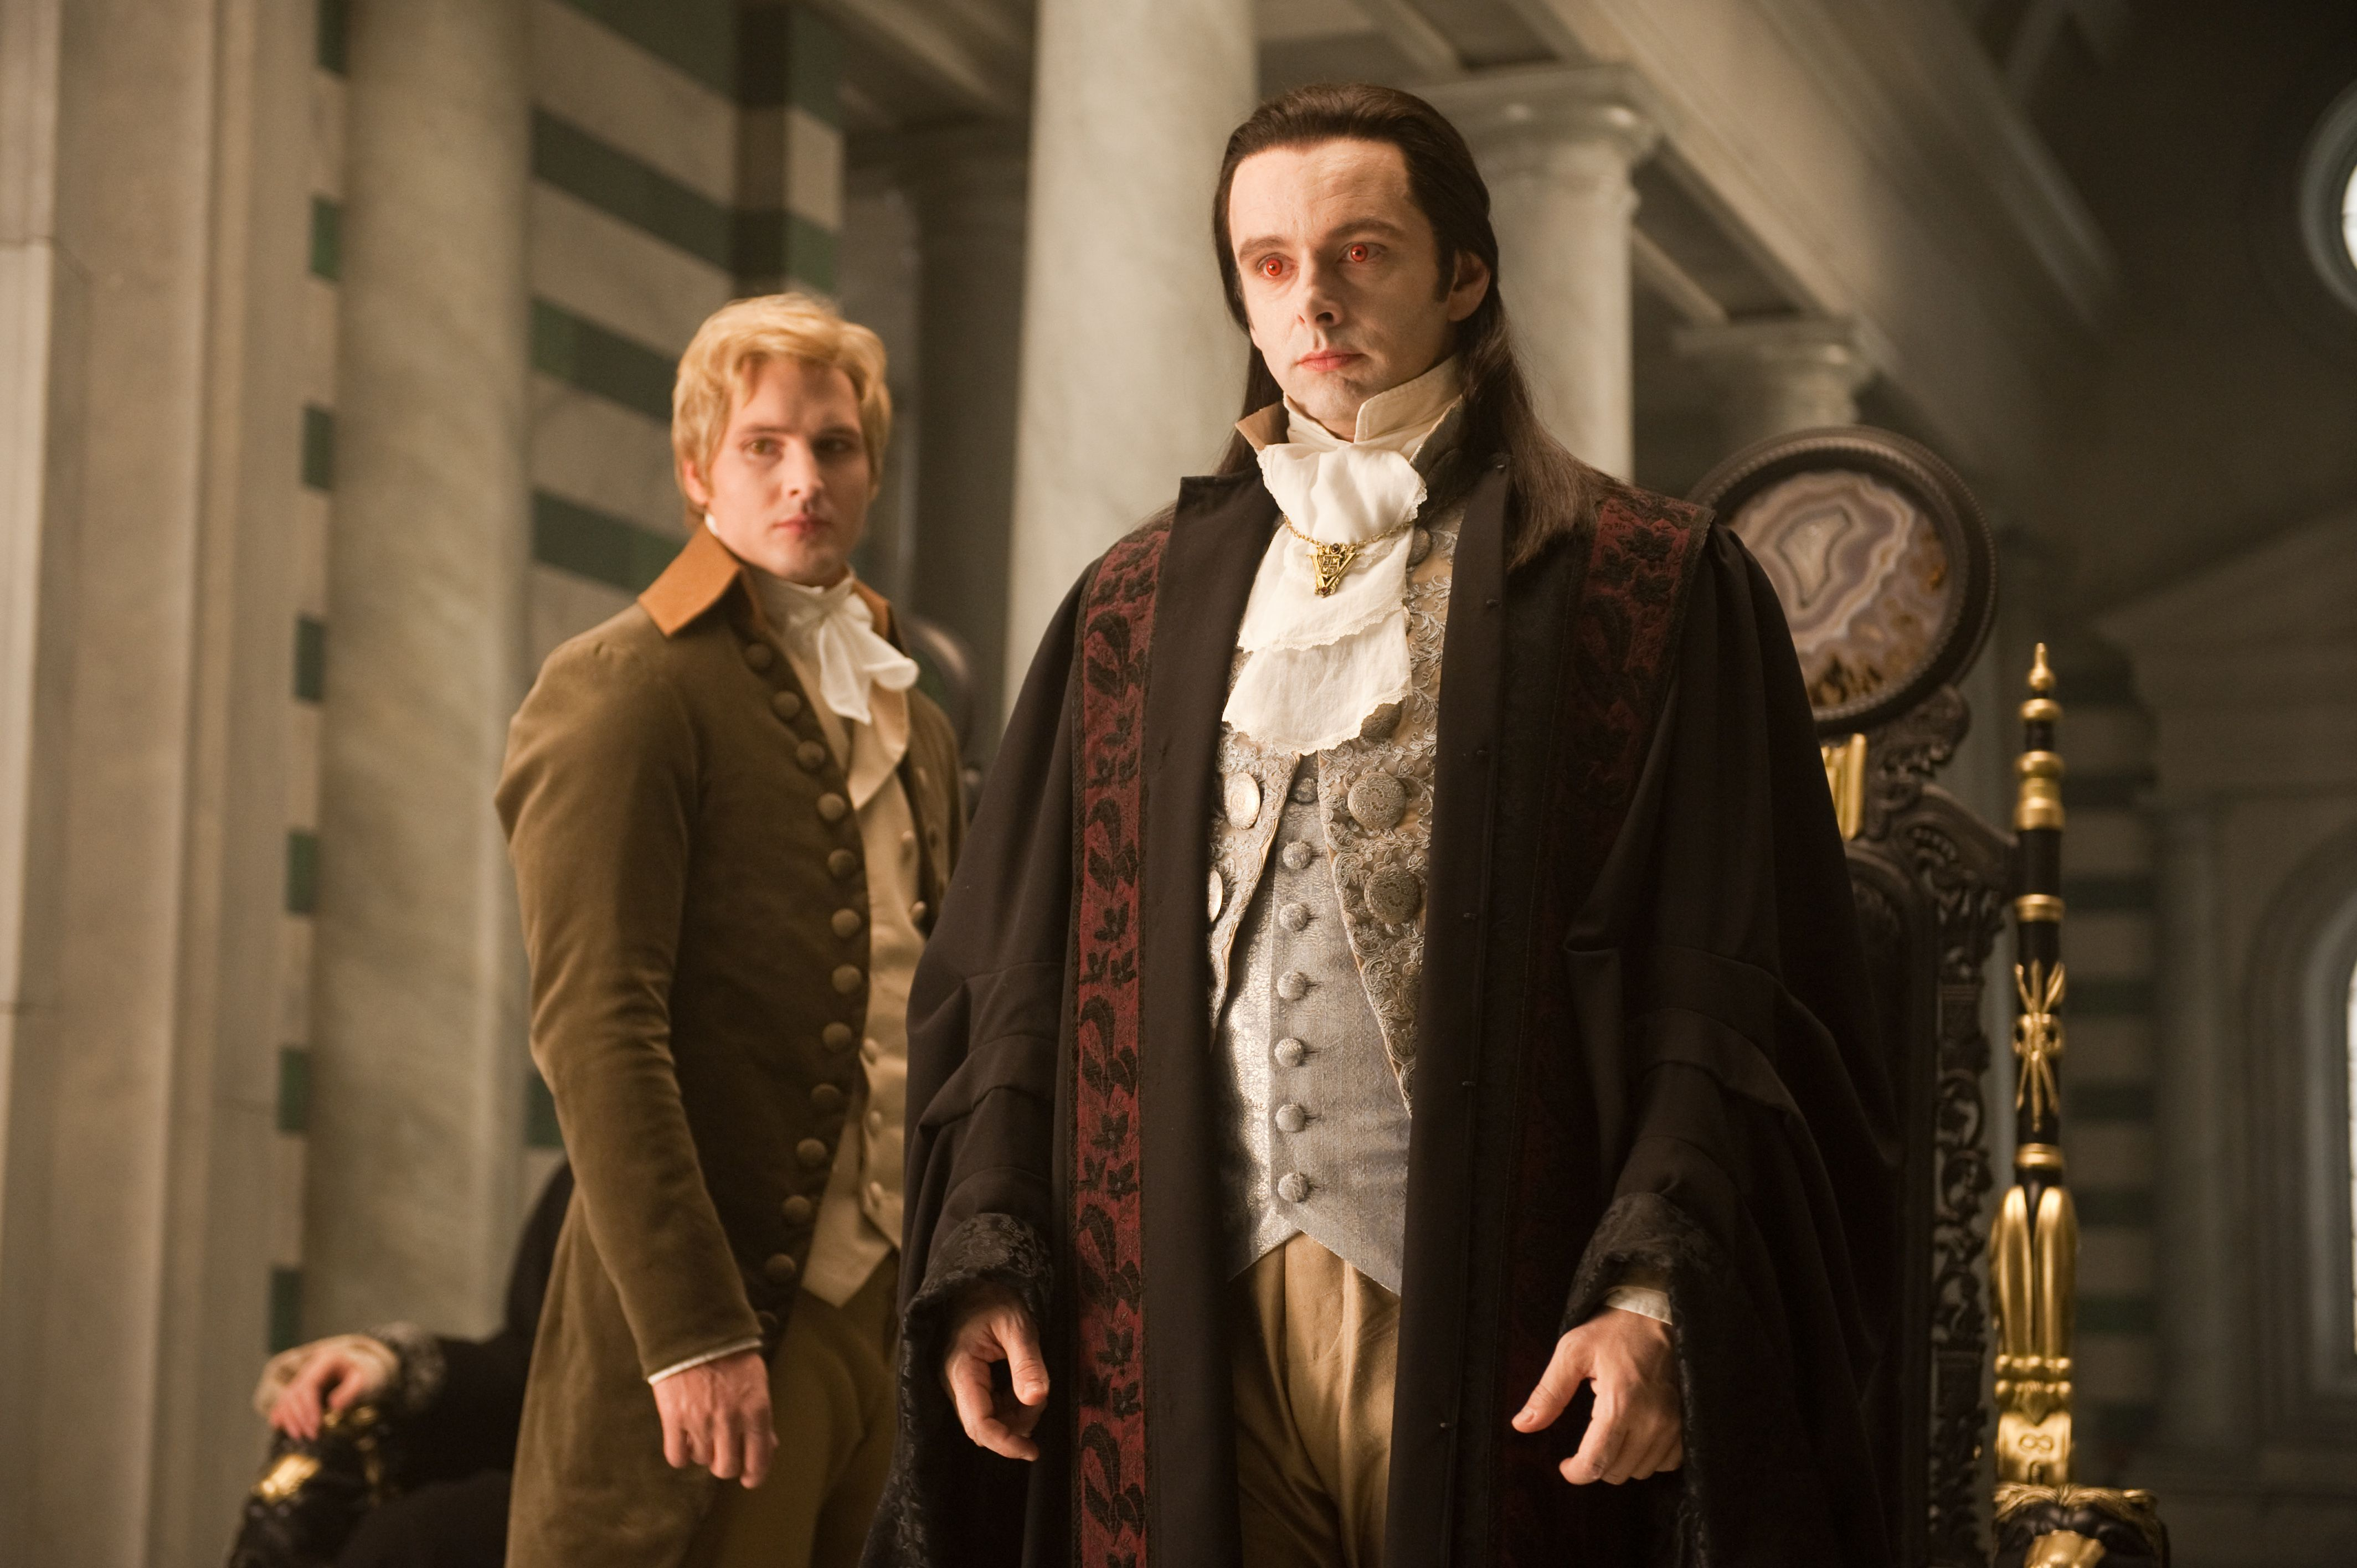 Carlisle & Aro flashback! The Twilight Saga: New Moon | The